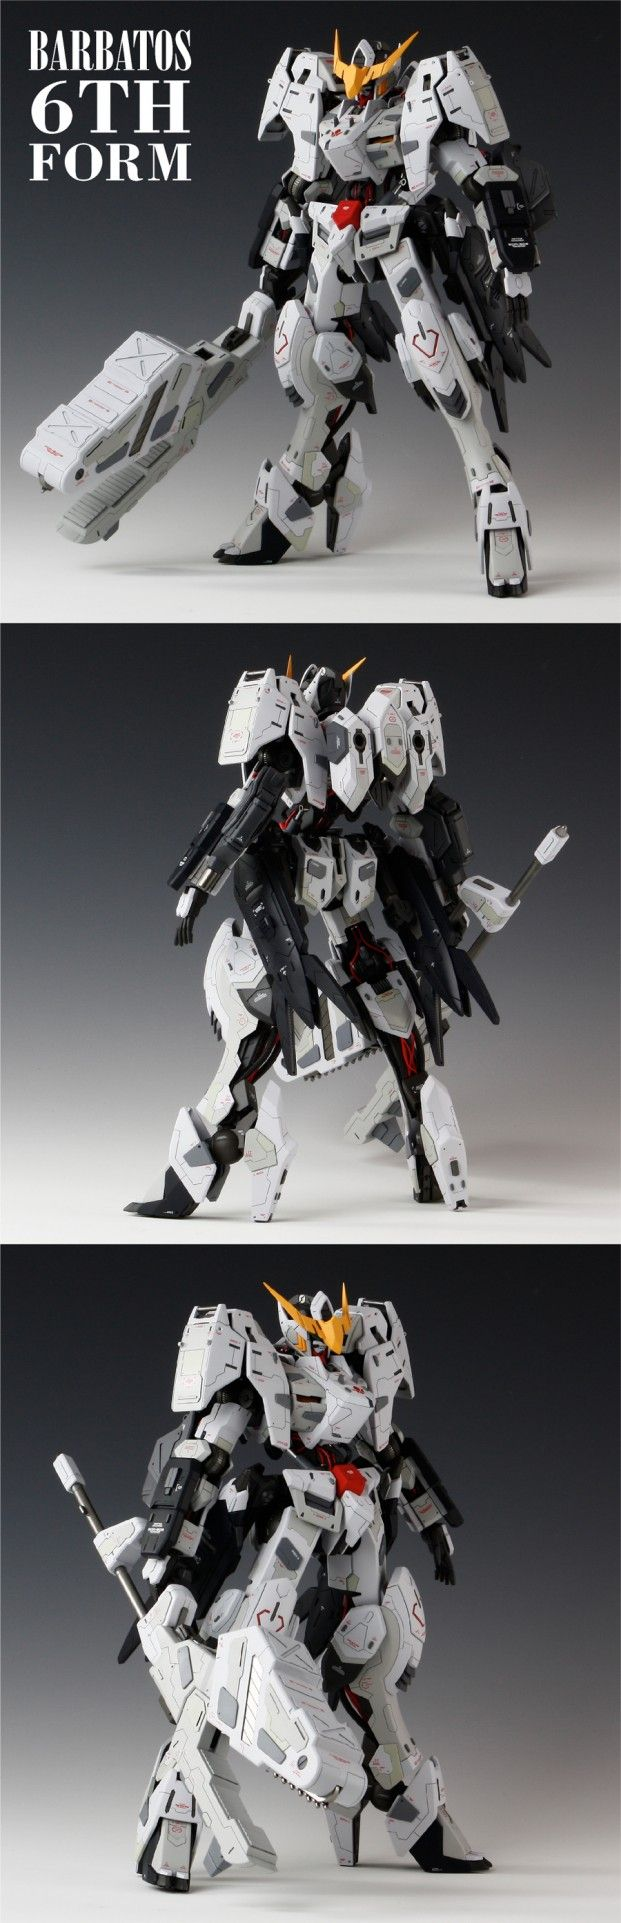 POINTNET.COM.HK - 情境作品 1/100 Gundam Barbatos